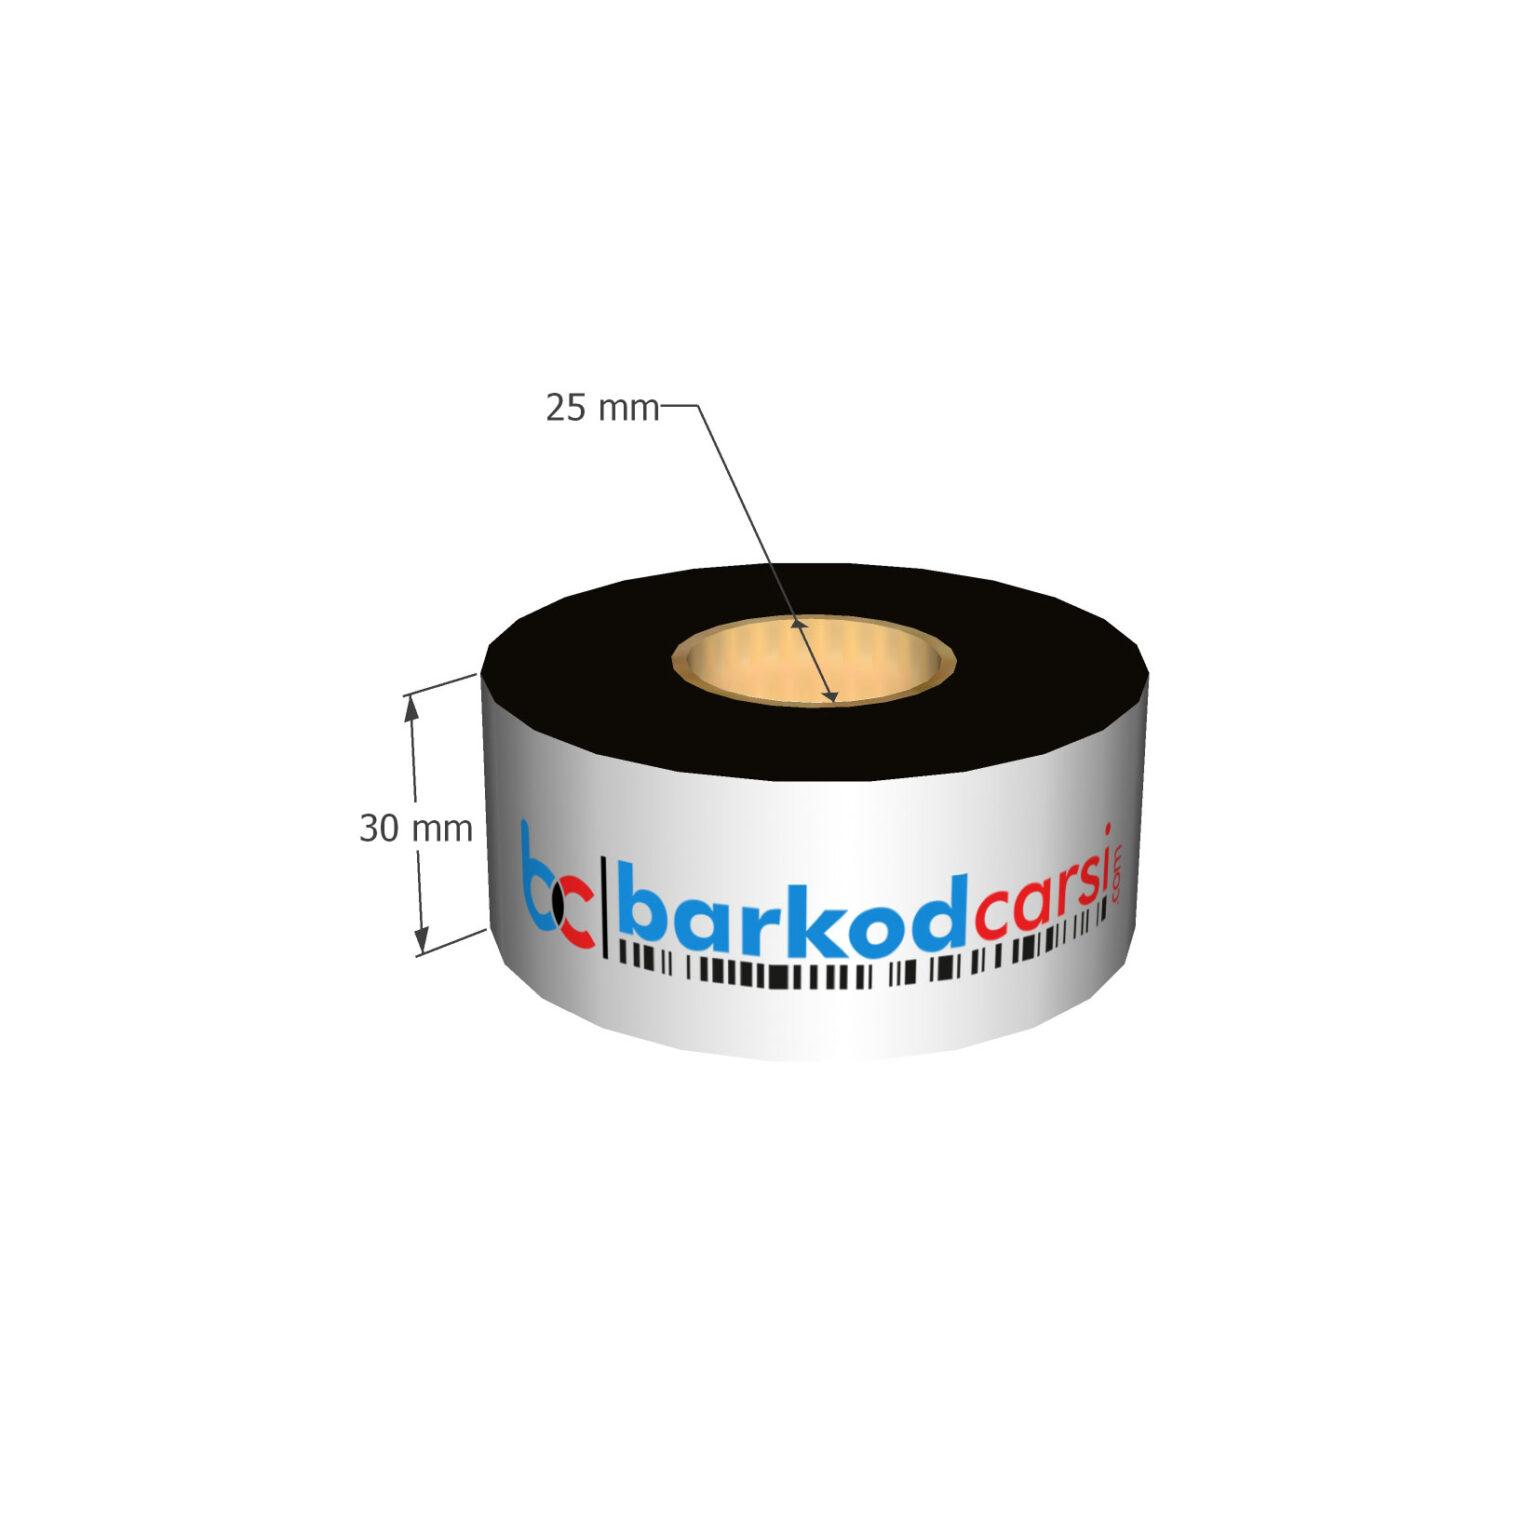 30x300 mt Wax / Wax-Resin / Resin / Hot-Foil Ribon Çeşitleri By BarkodCarsi.com